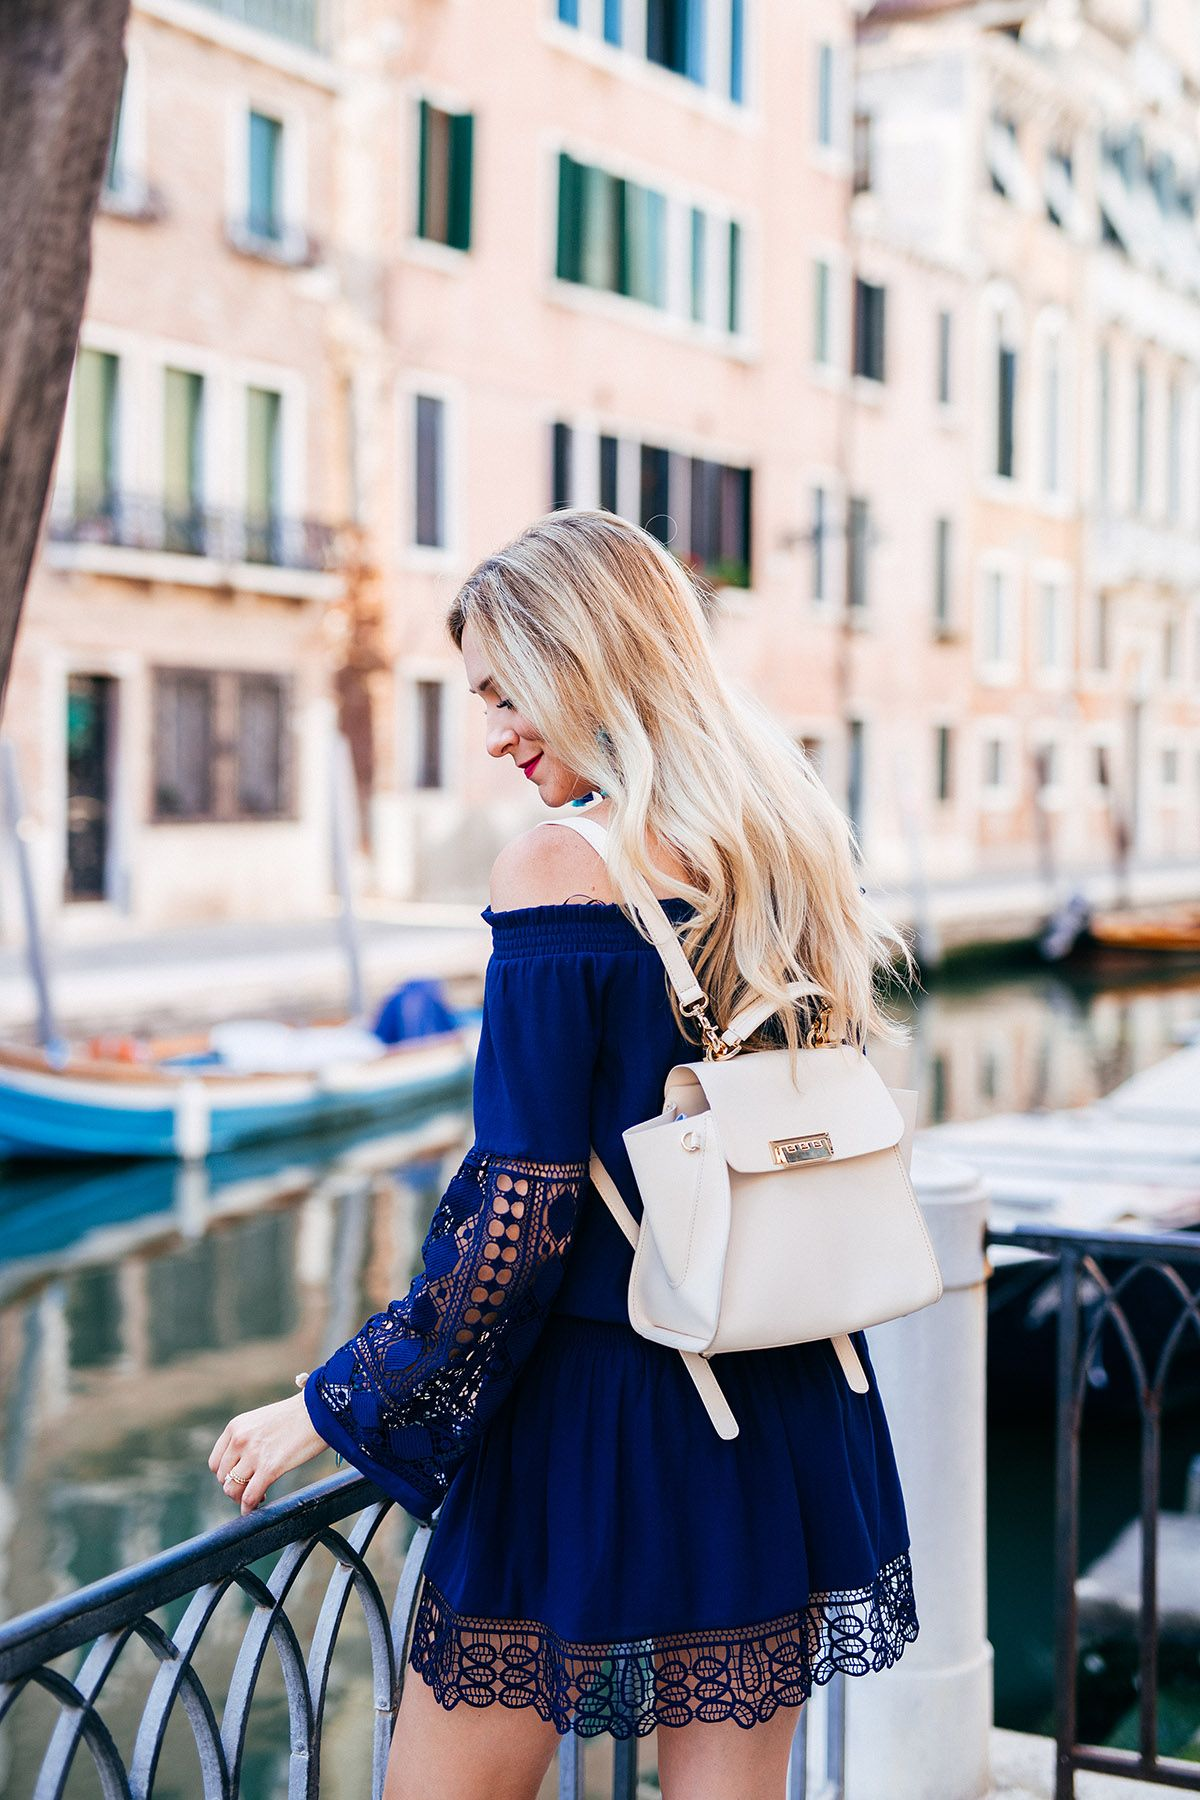 24 Hours In Venice Simply Fashion Women Backpack Fashion Fashion